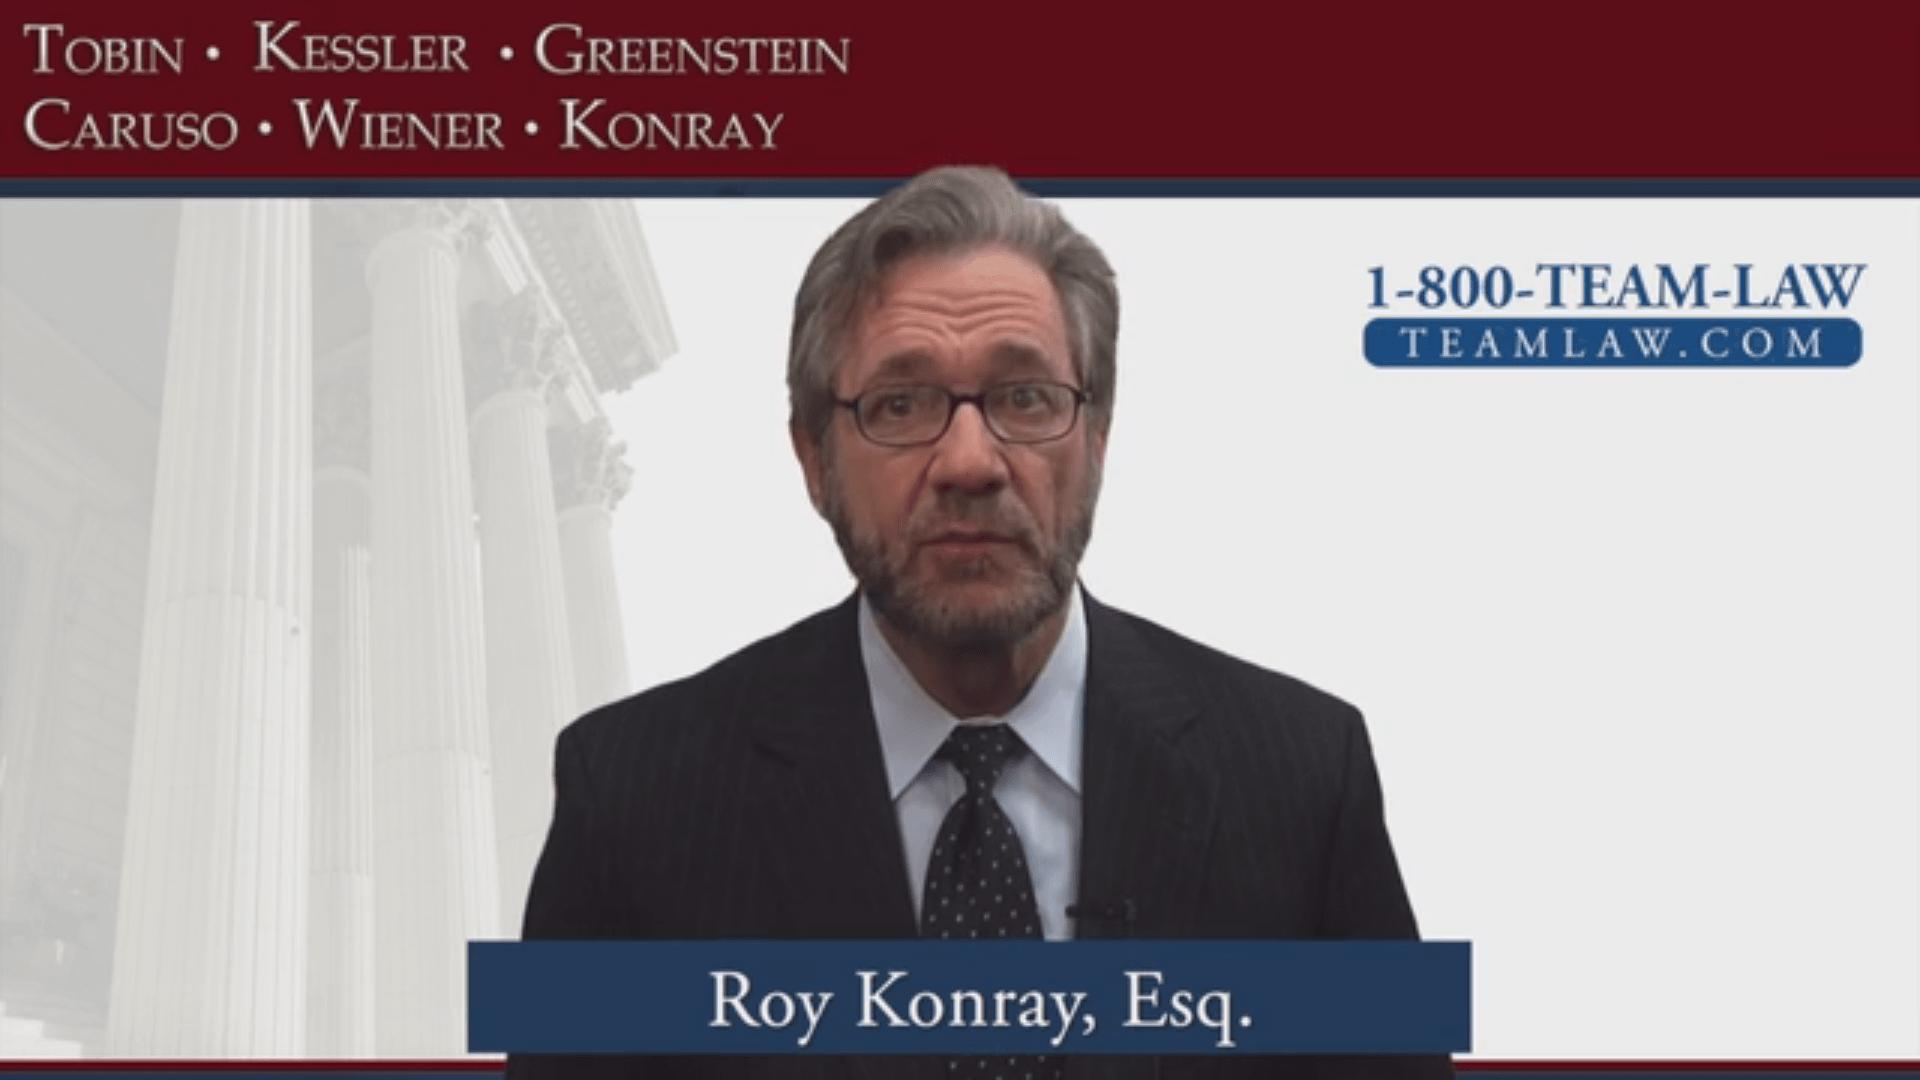 Team Law Profile Roy v.2